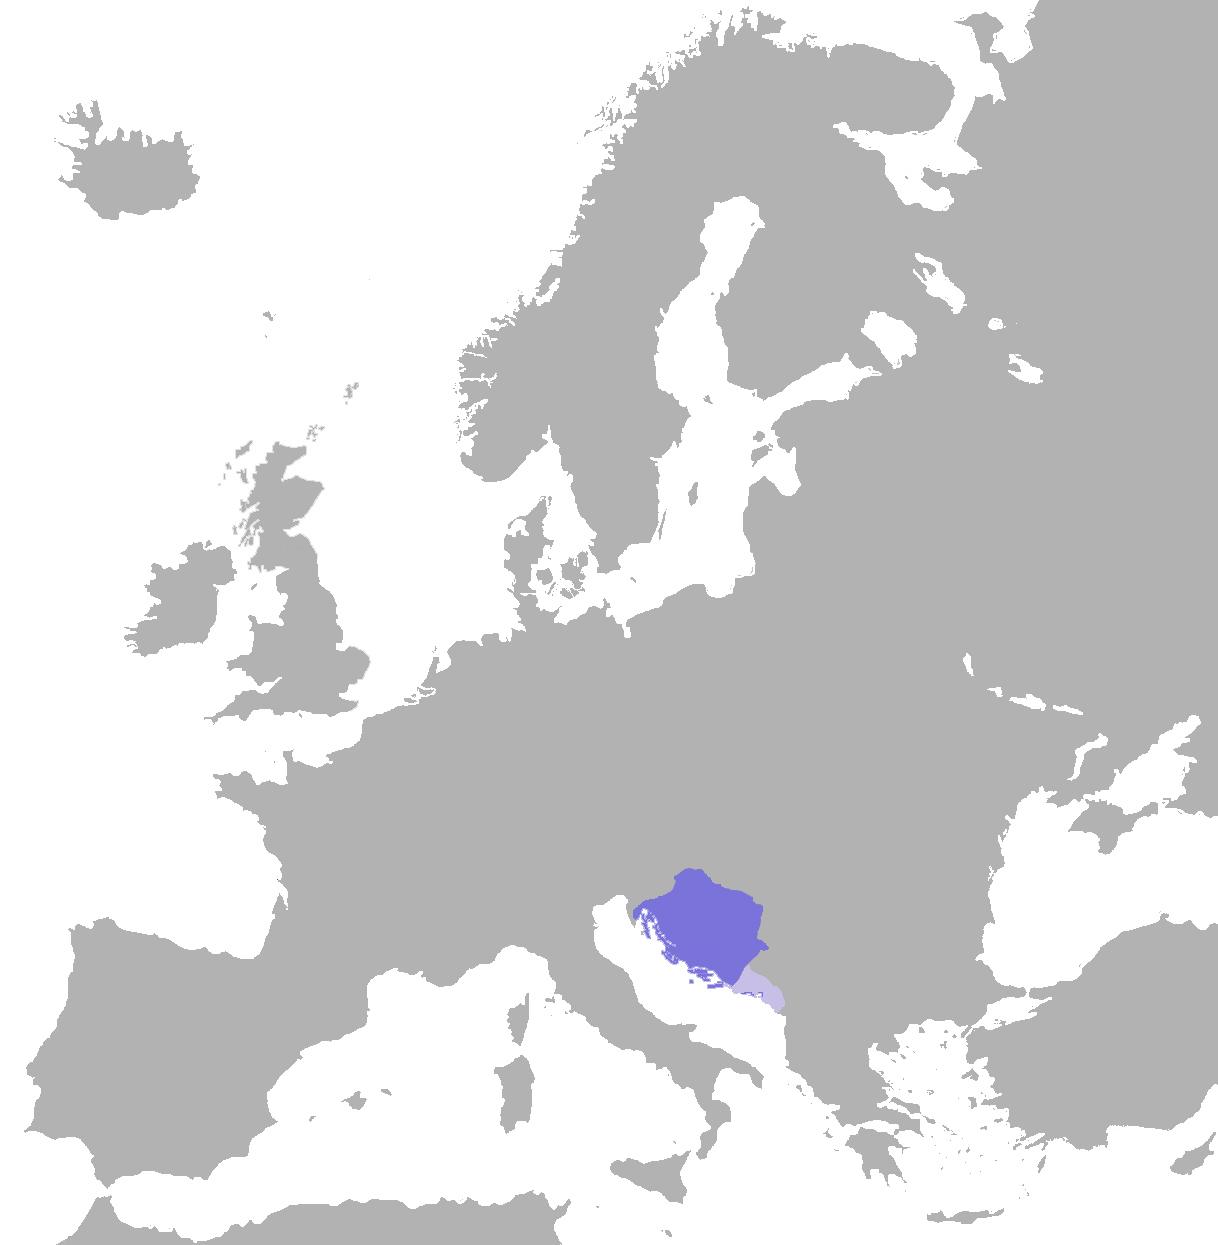 Kingdom Of Croatia 925 1102 Wikipedia